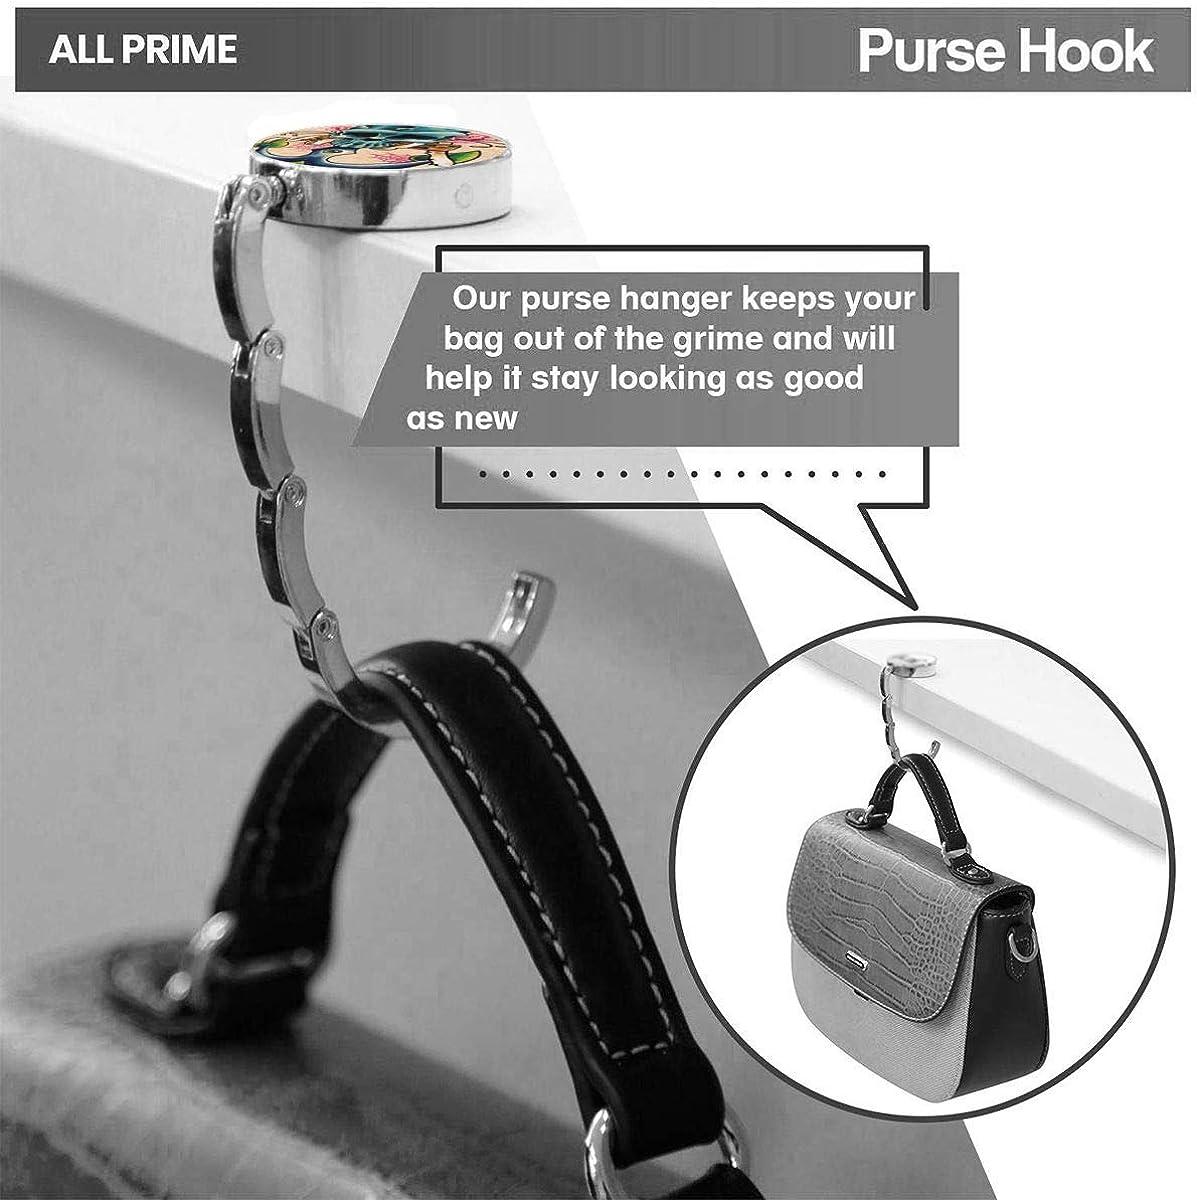 Tiger Black And White Animal Table Hook Folding Bag Desk Hanger Foldable Holder